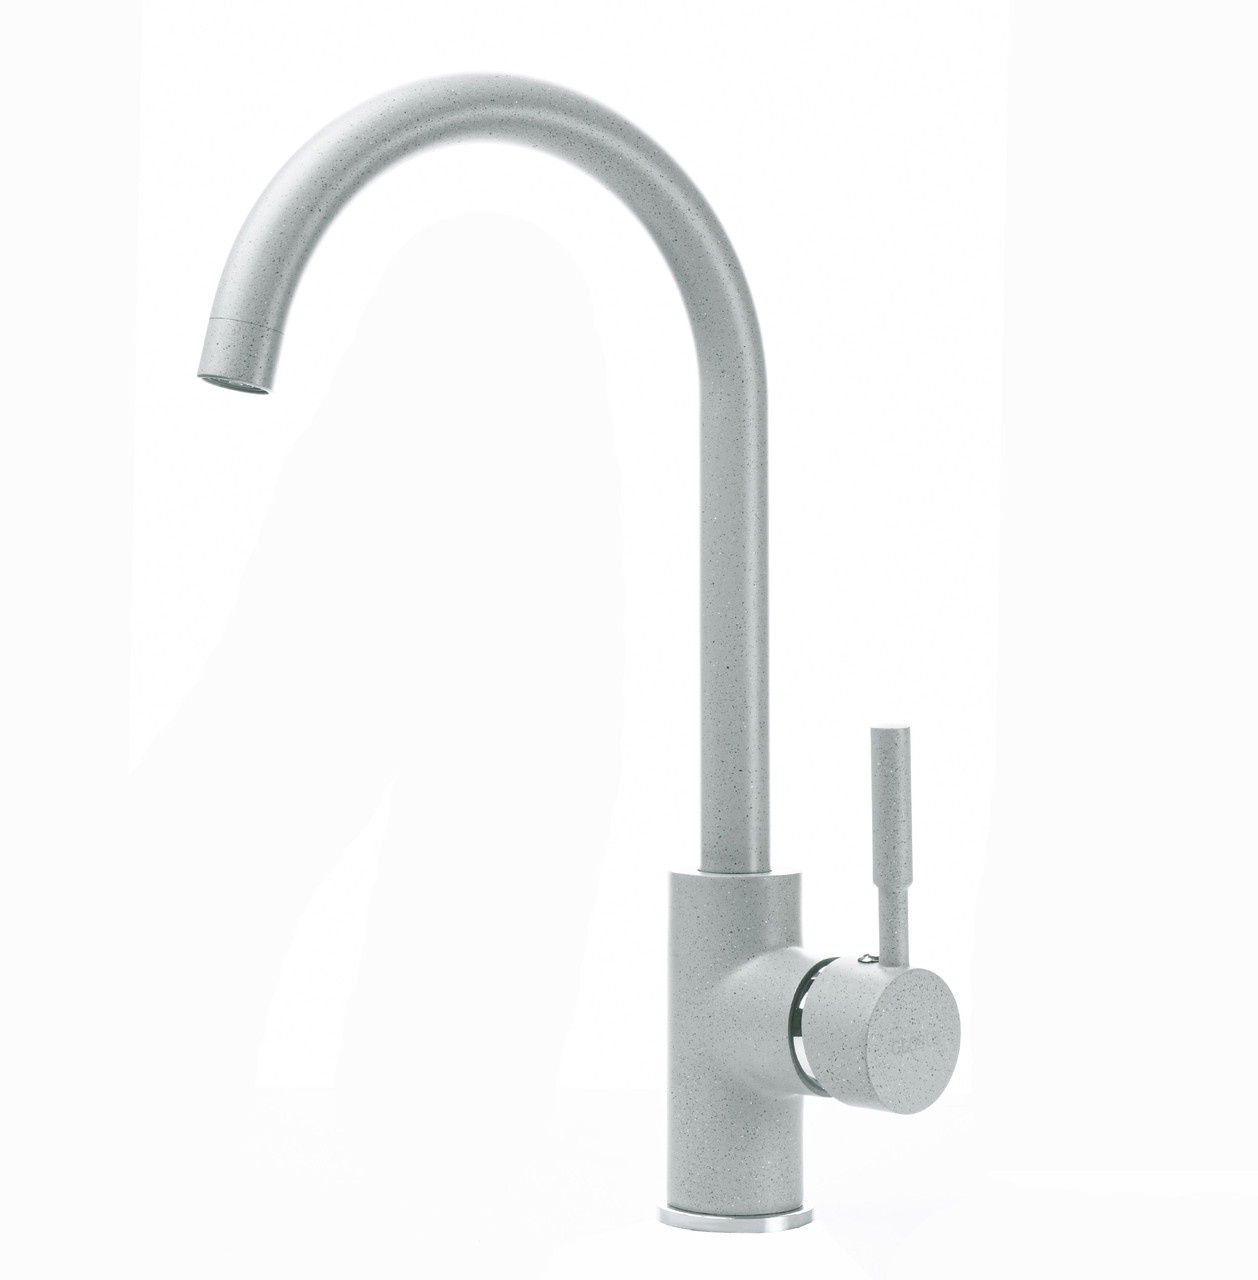 Змішувач для кухні Globus Lux LAZER GLLR-0203S-2-ARENA